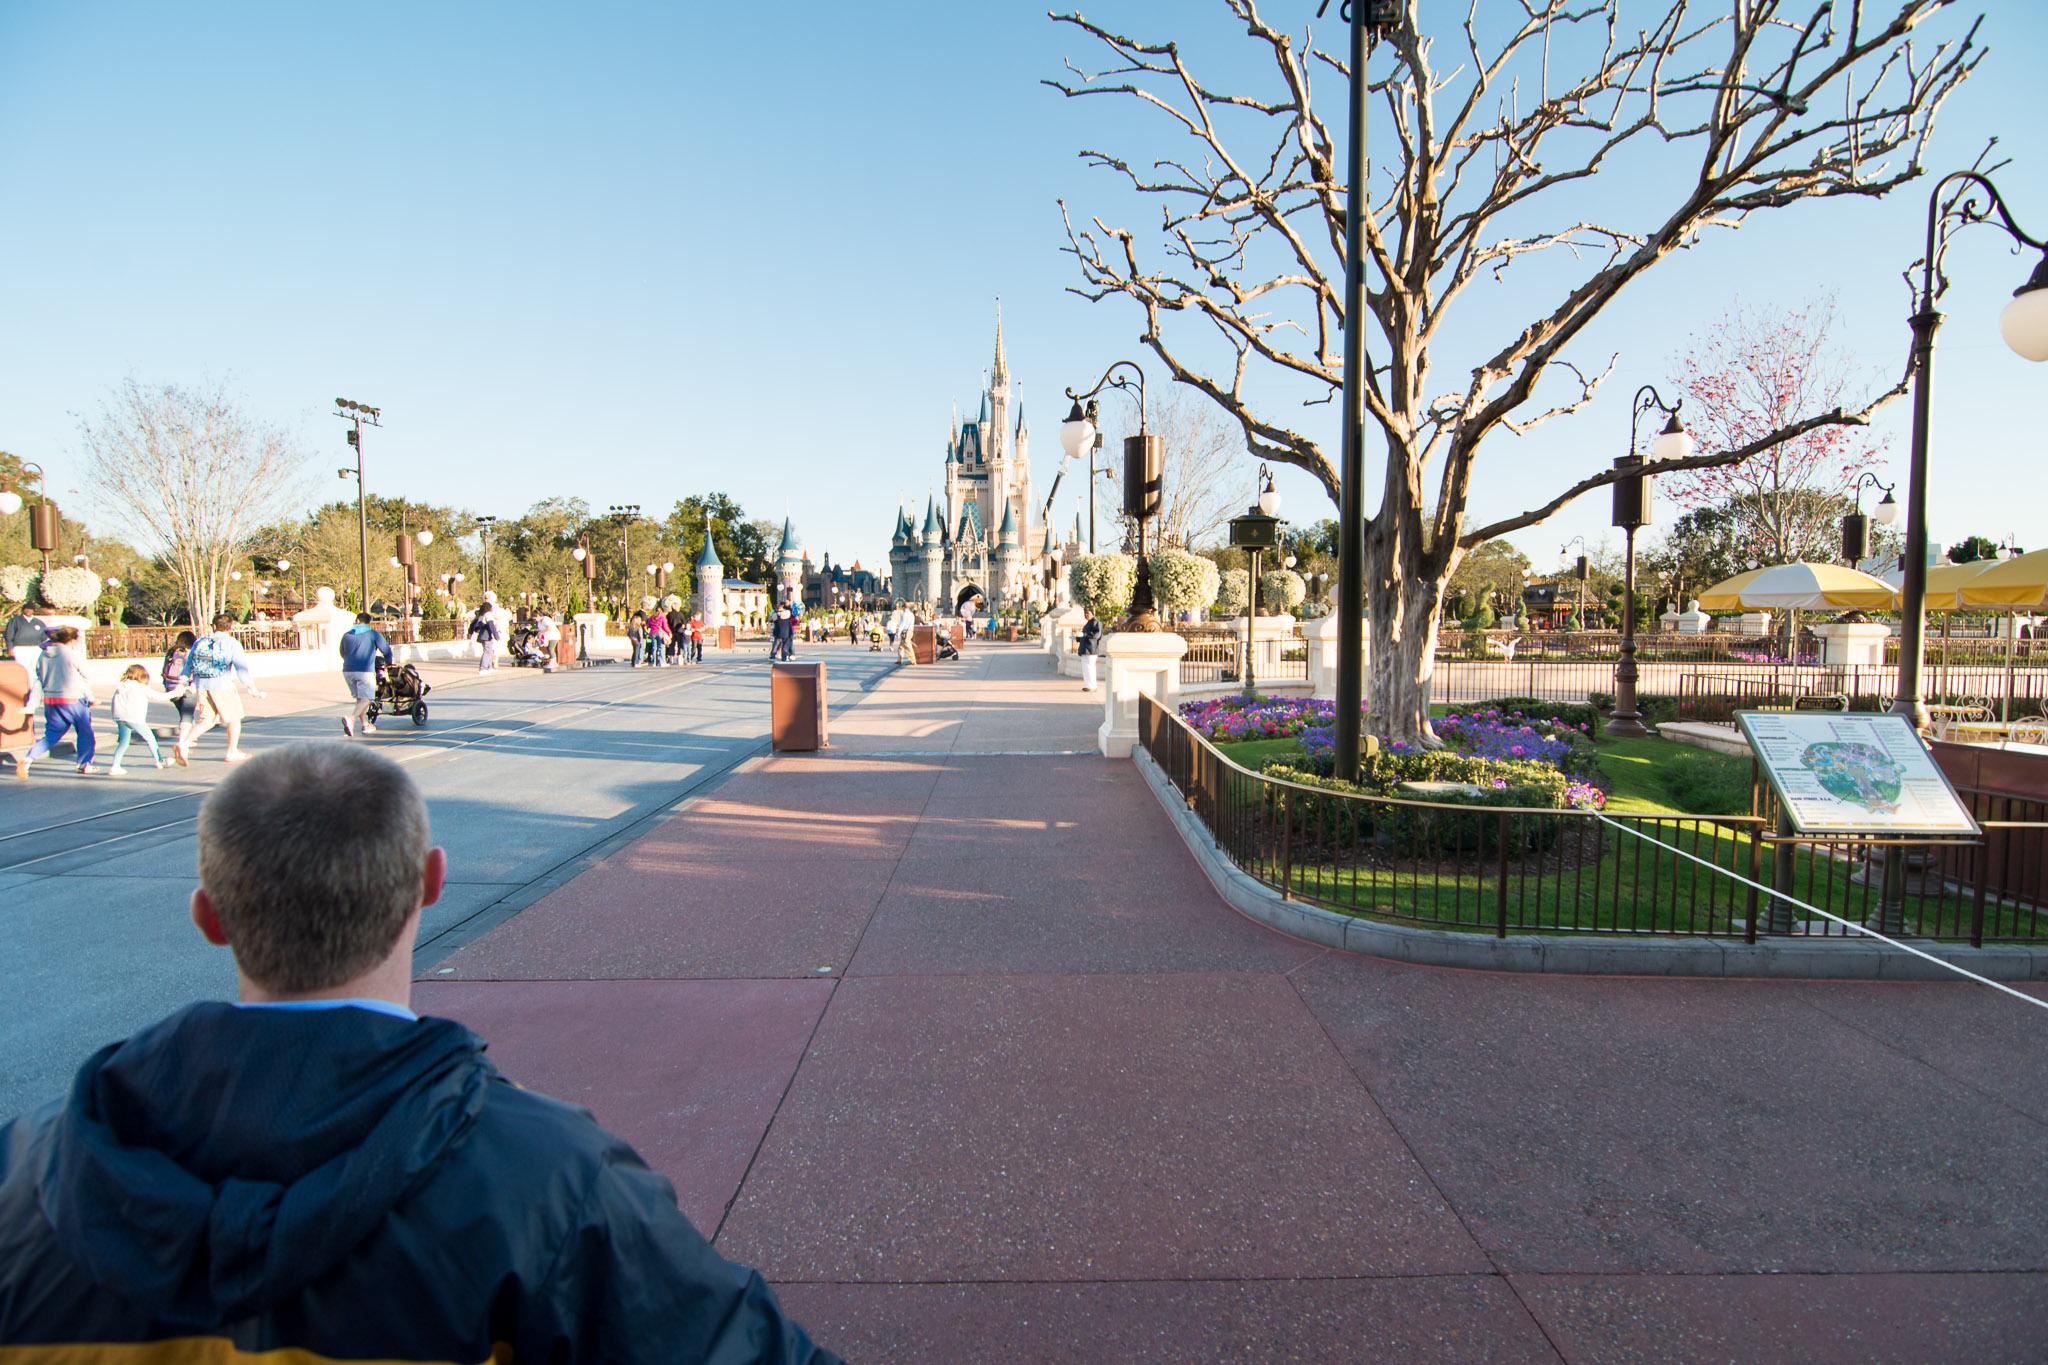 Castle at Rope Drop - Walt Disney World Magic Kingdom